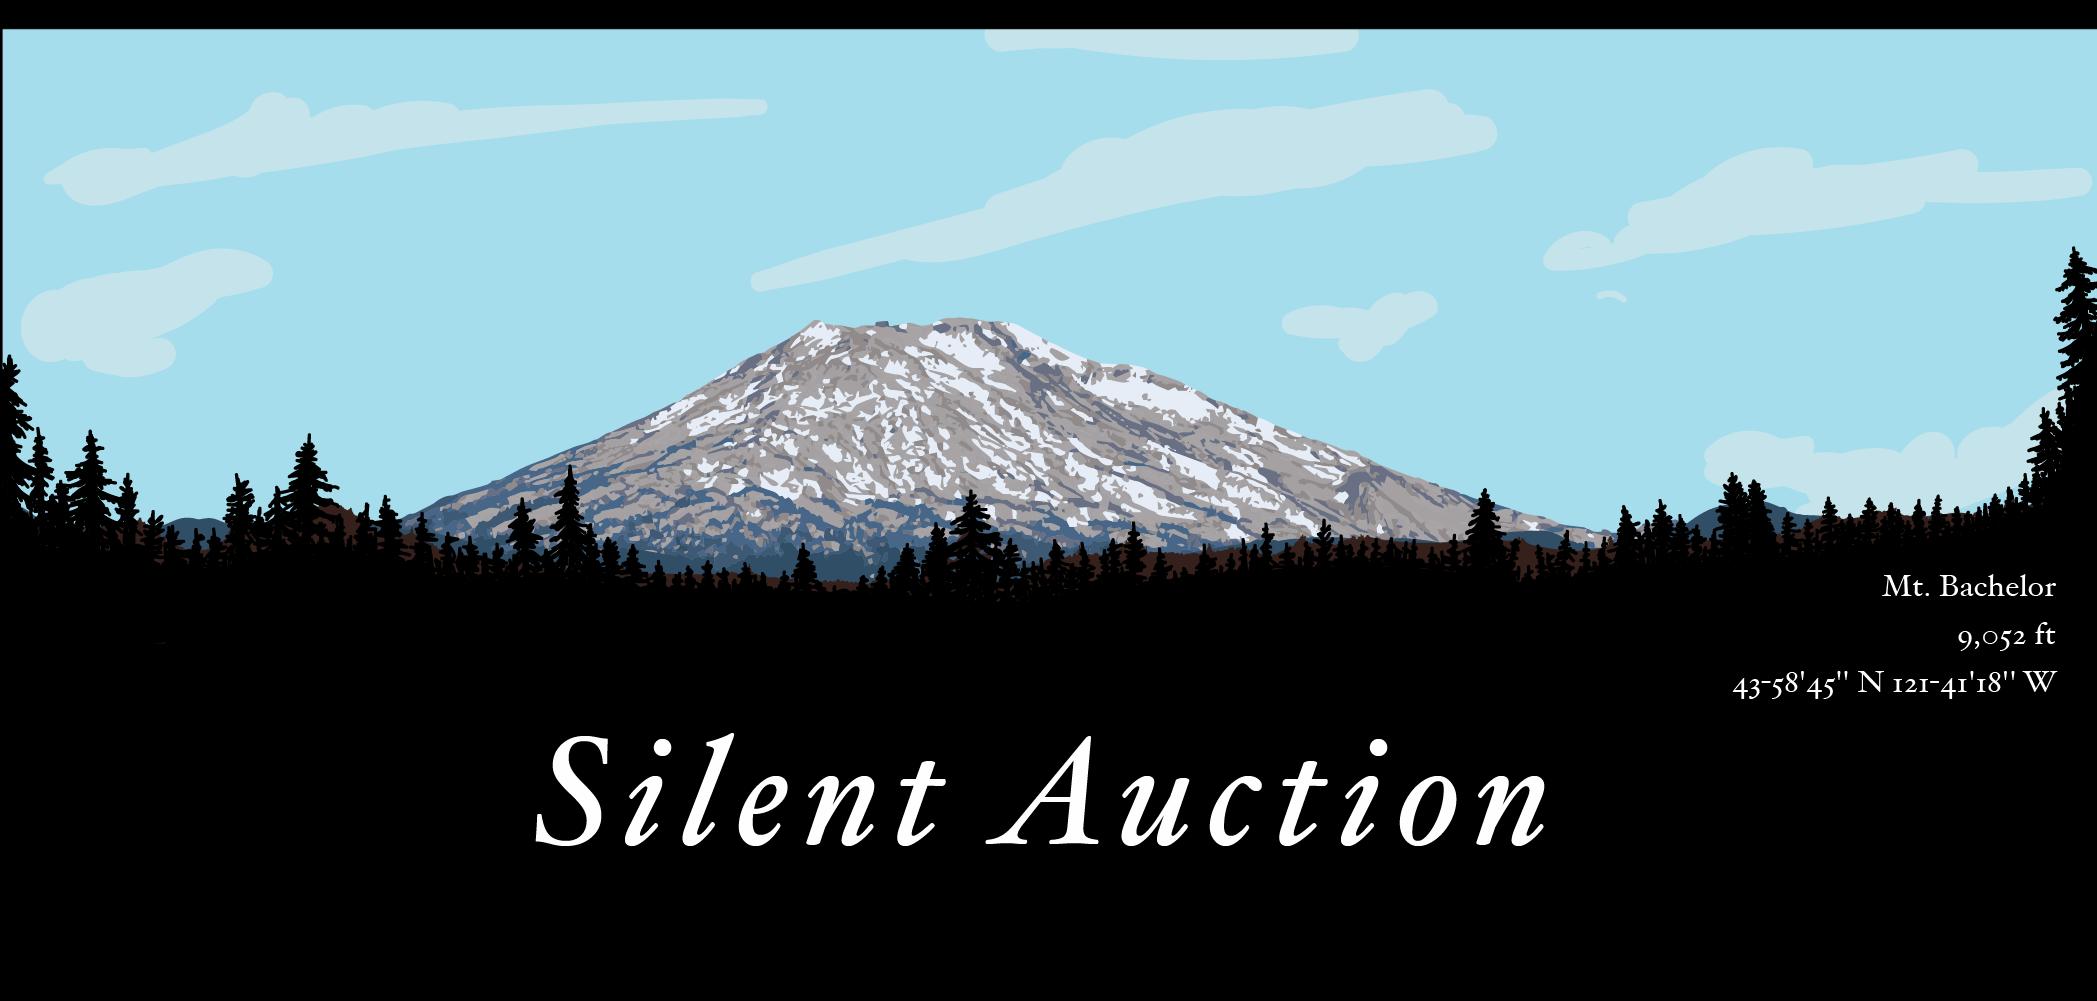 PMR2019_Silent Auction_Mockup-01.png